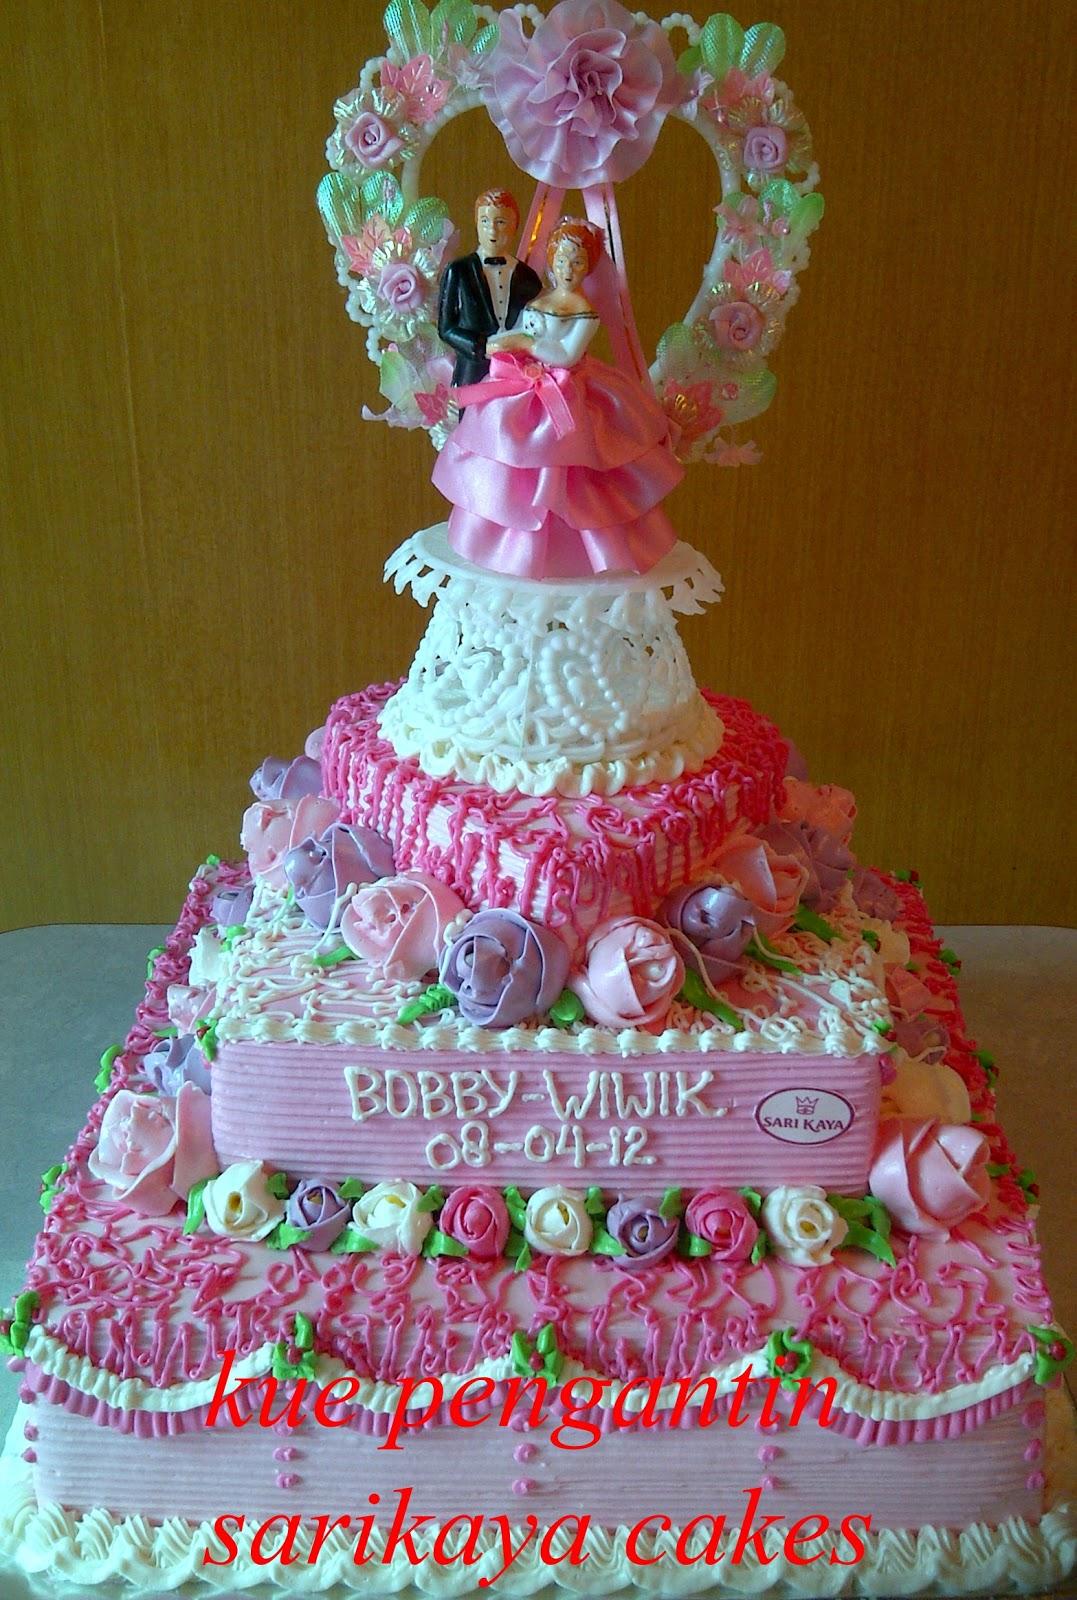 sarikaya cakes kue pengantin stack by sarikaya cakes